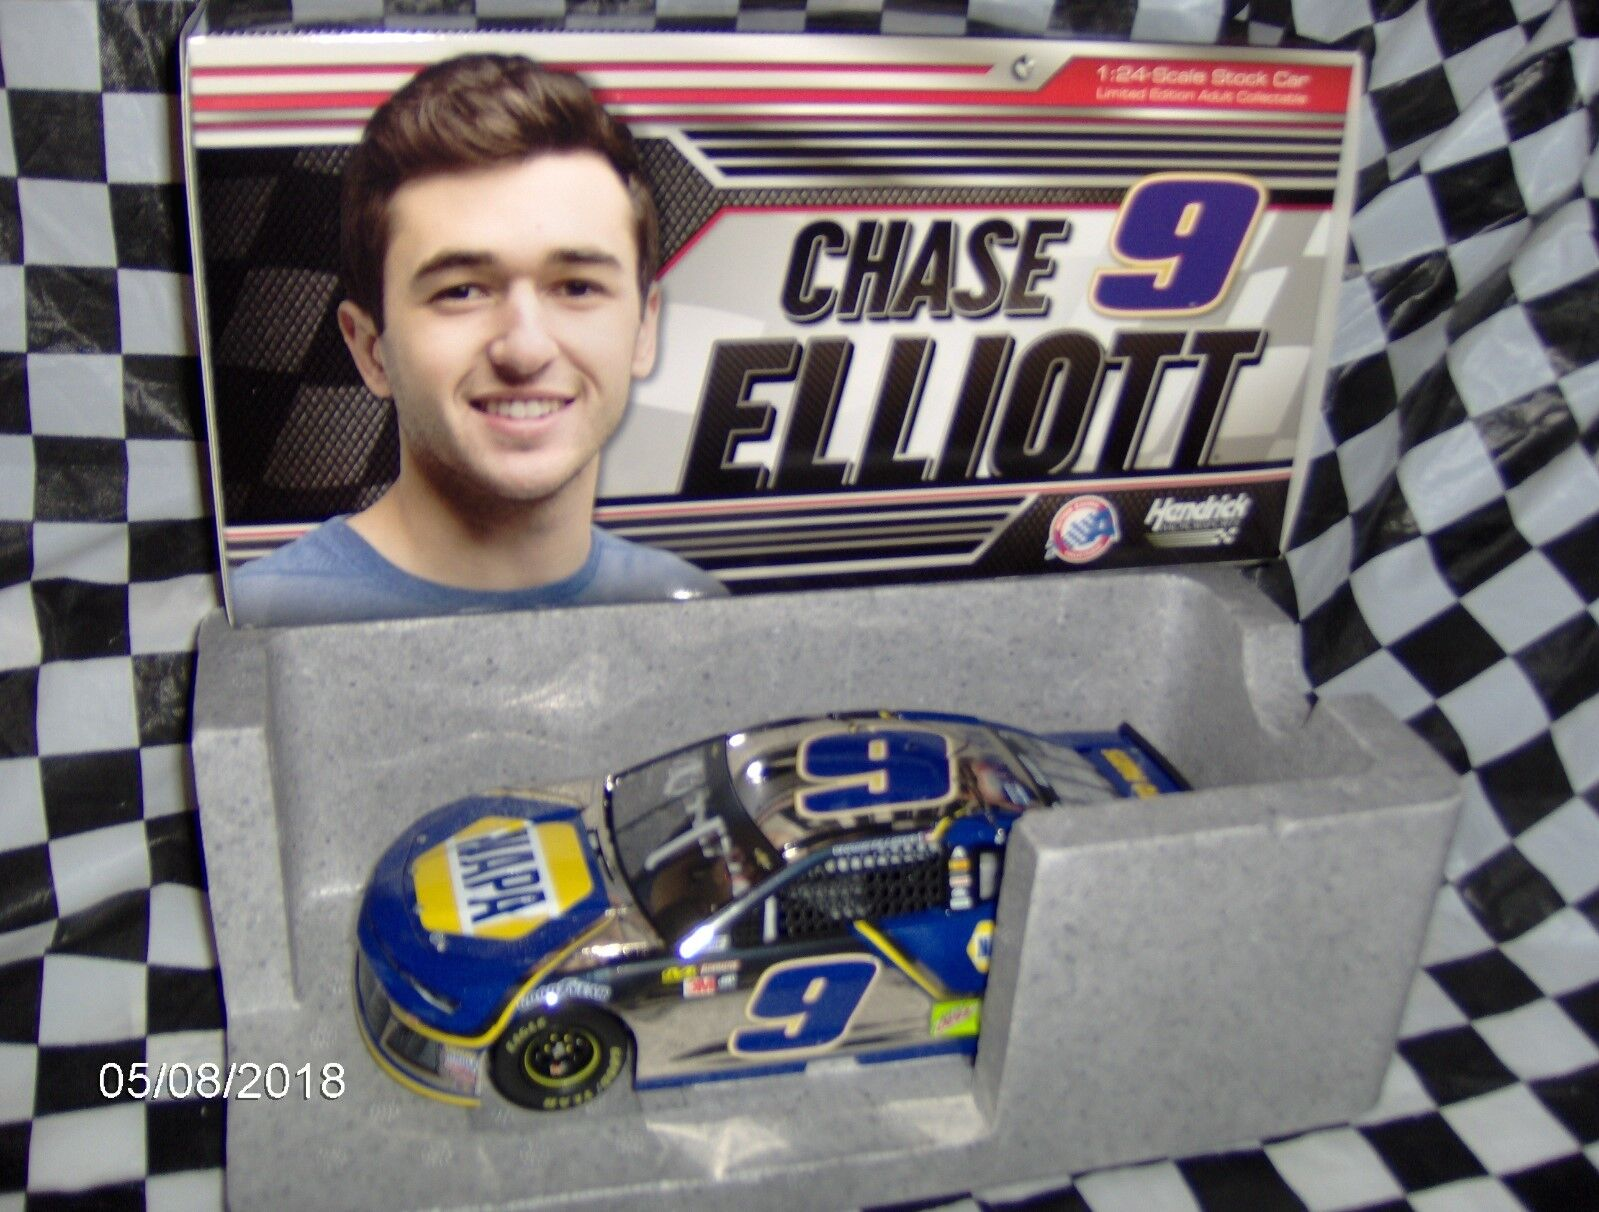 2018 Chase Elliott   9 NAPA Coloree Chrome 1 24th